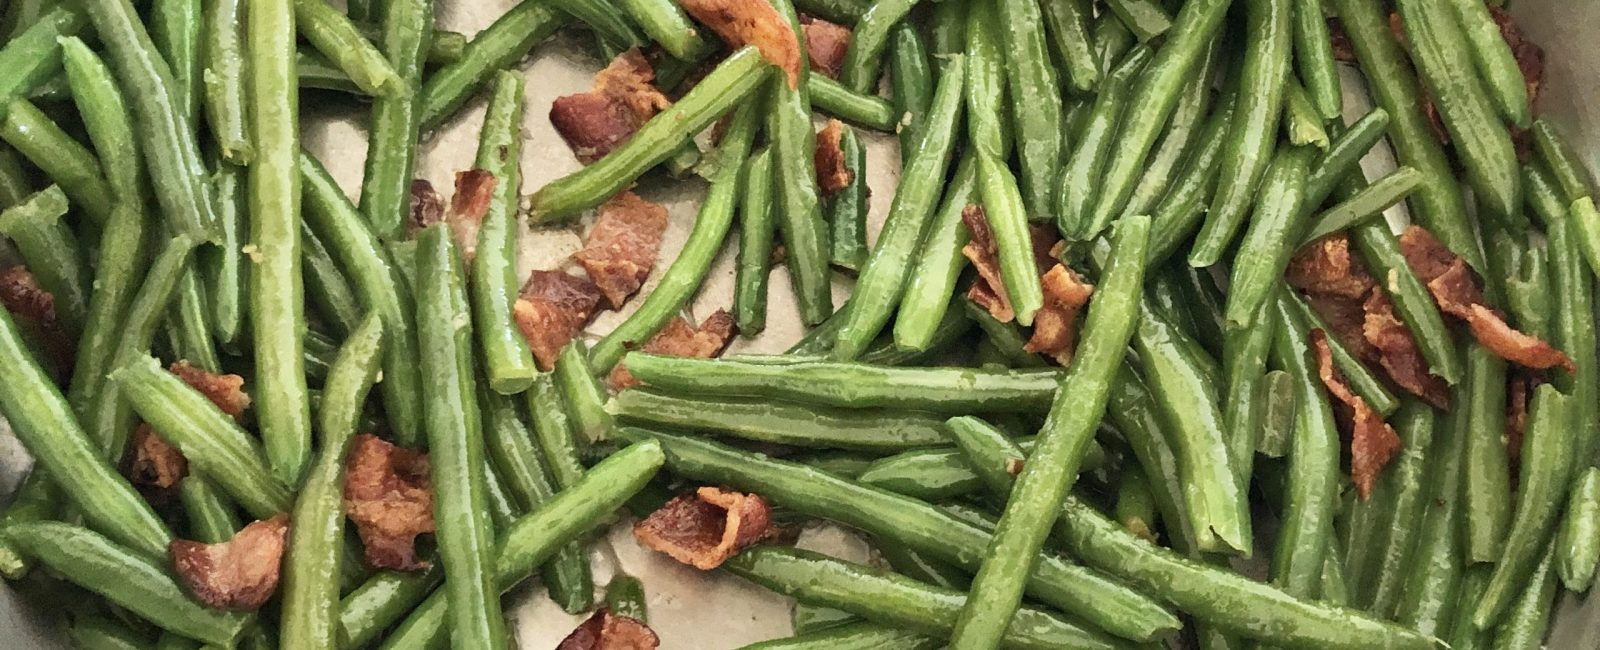 Grandma's Simple Bacon Green Beans